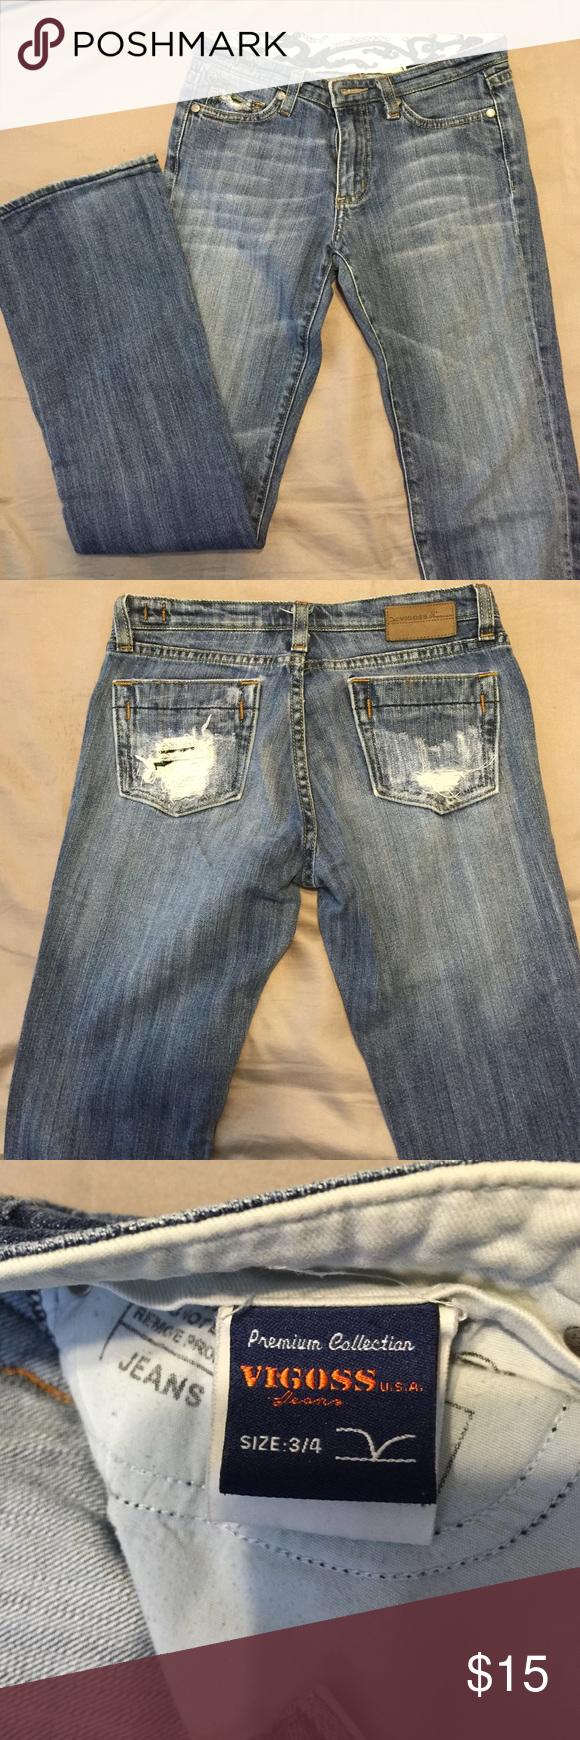 "Vigoss jeans slight boot cut -sz 3/4 Gentle used jeans. Great condition size 3/4. 31"" inseam Vigoss Jeans Boot Cut"